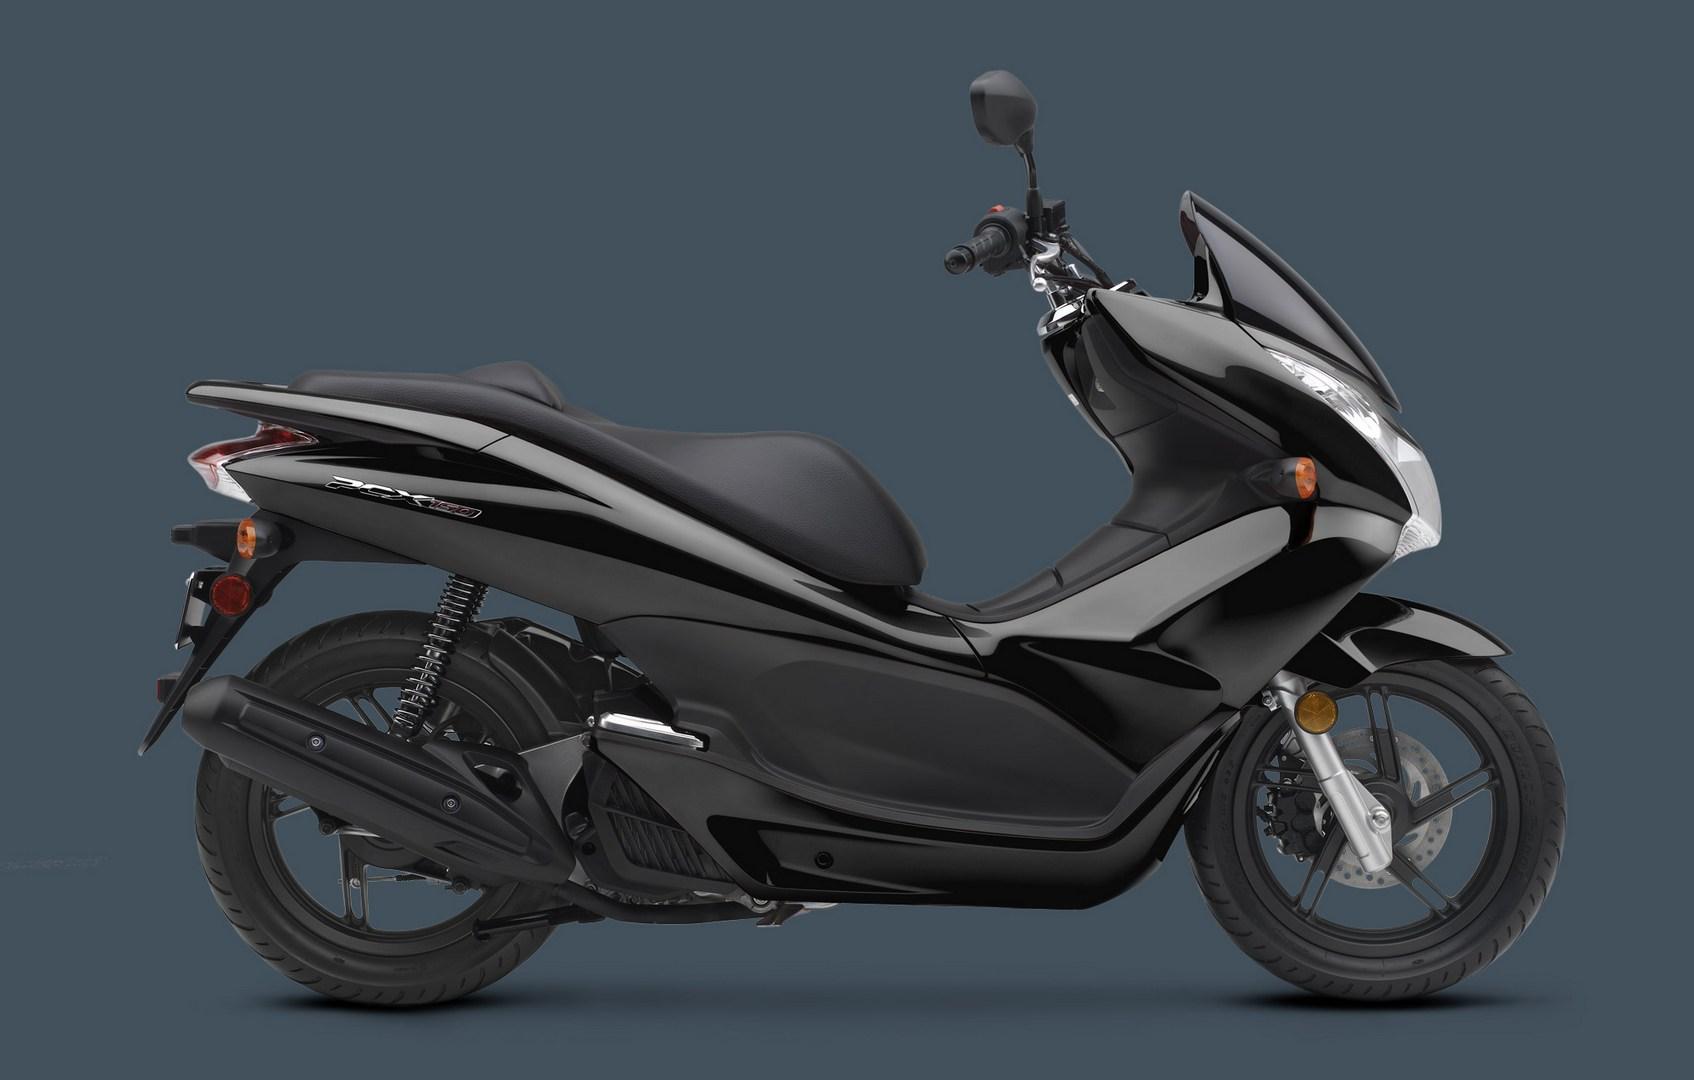 Honda Pcx Electric >> 2013 Honda PCX150 Scooter Does 102 mpg (2.3 l/ 100 km) - autoevolution